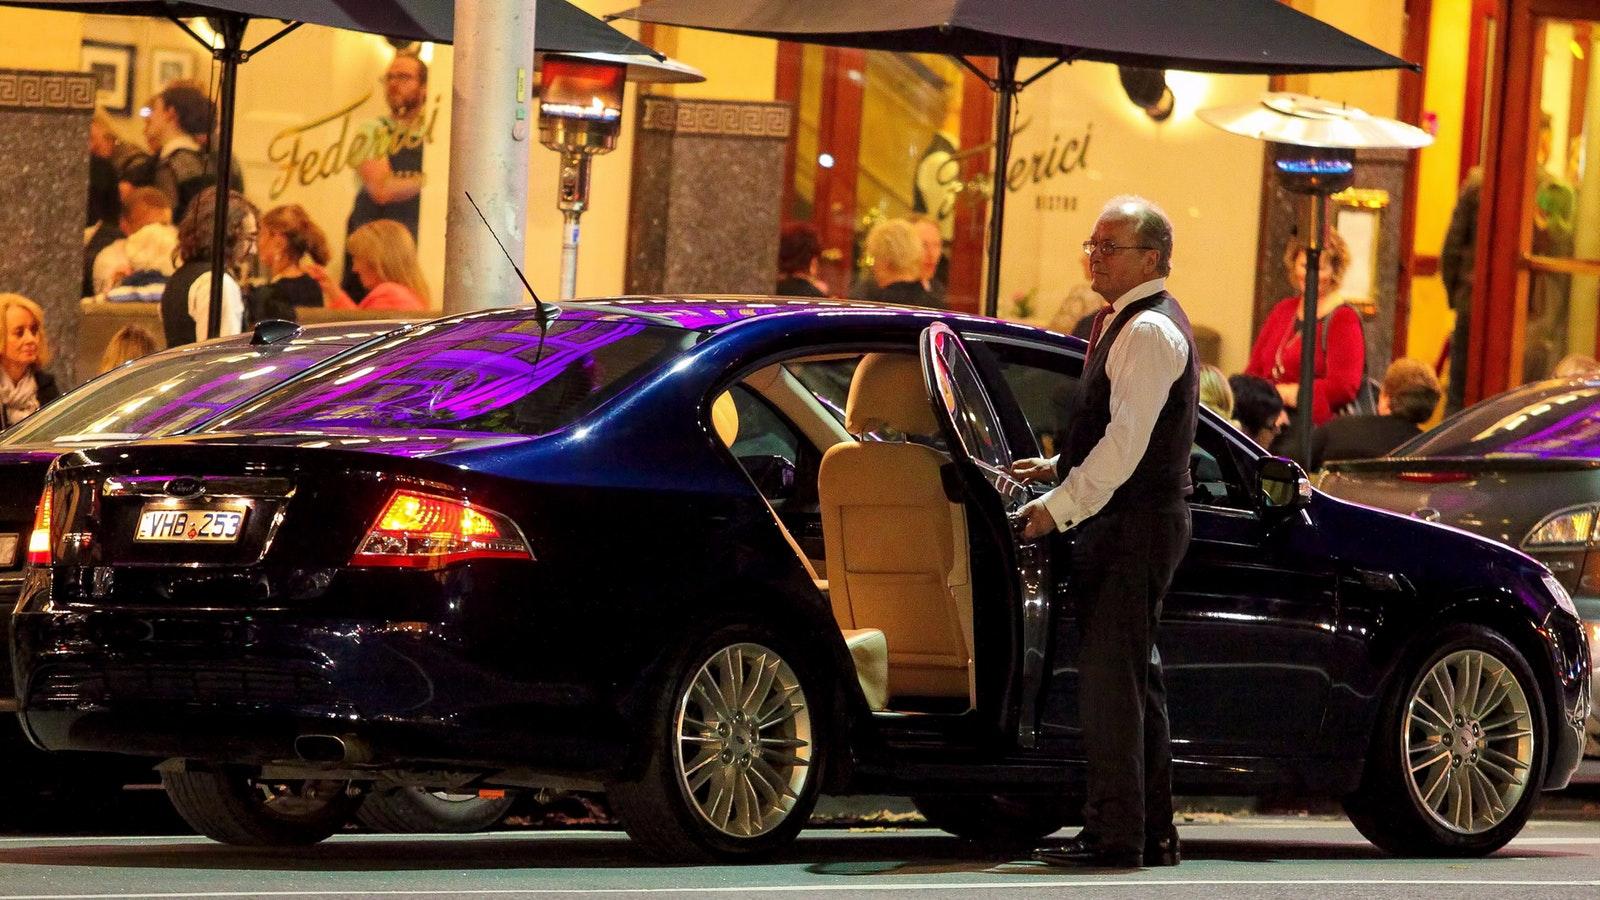 Your Gisborne Cab awaits